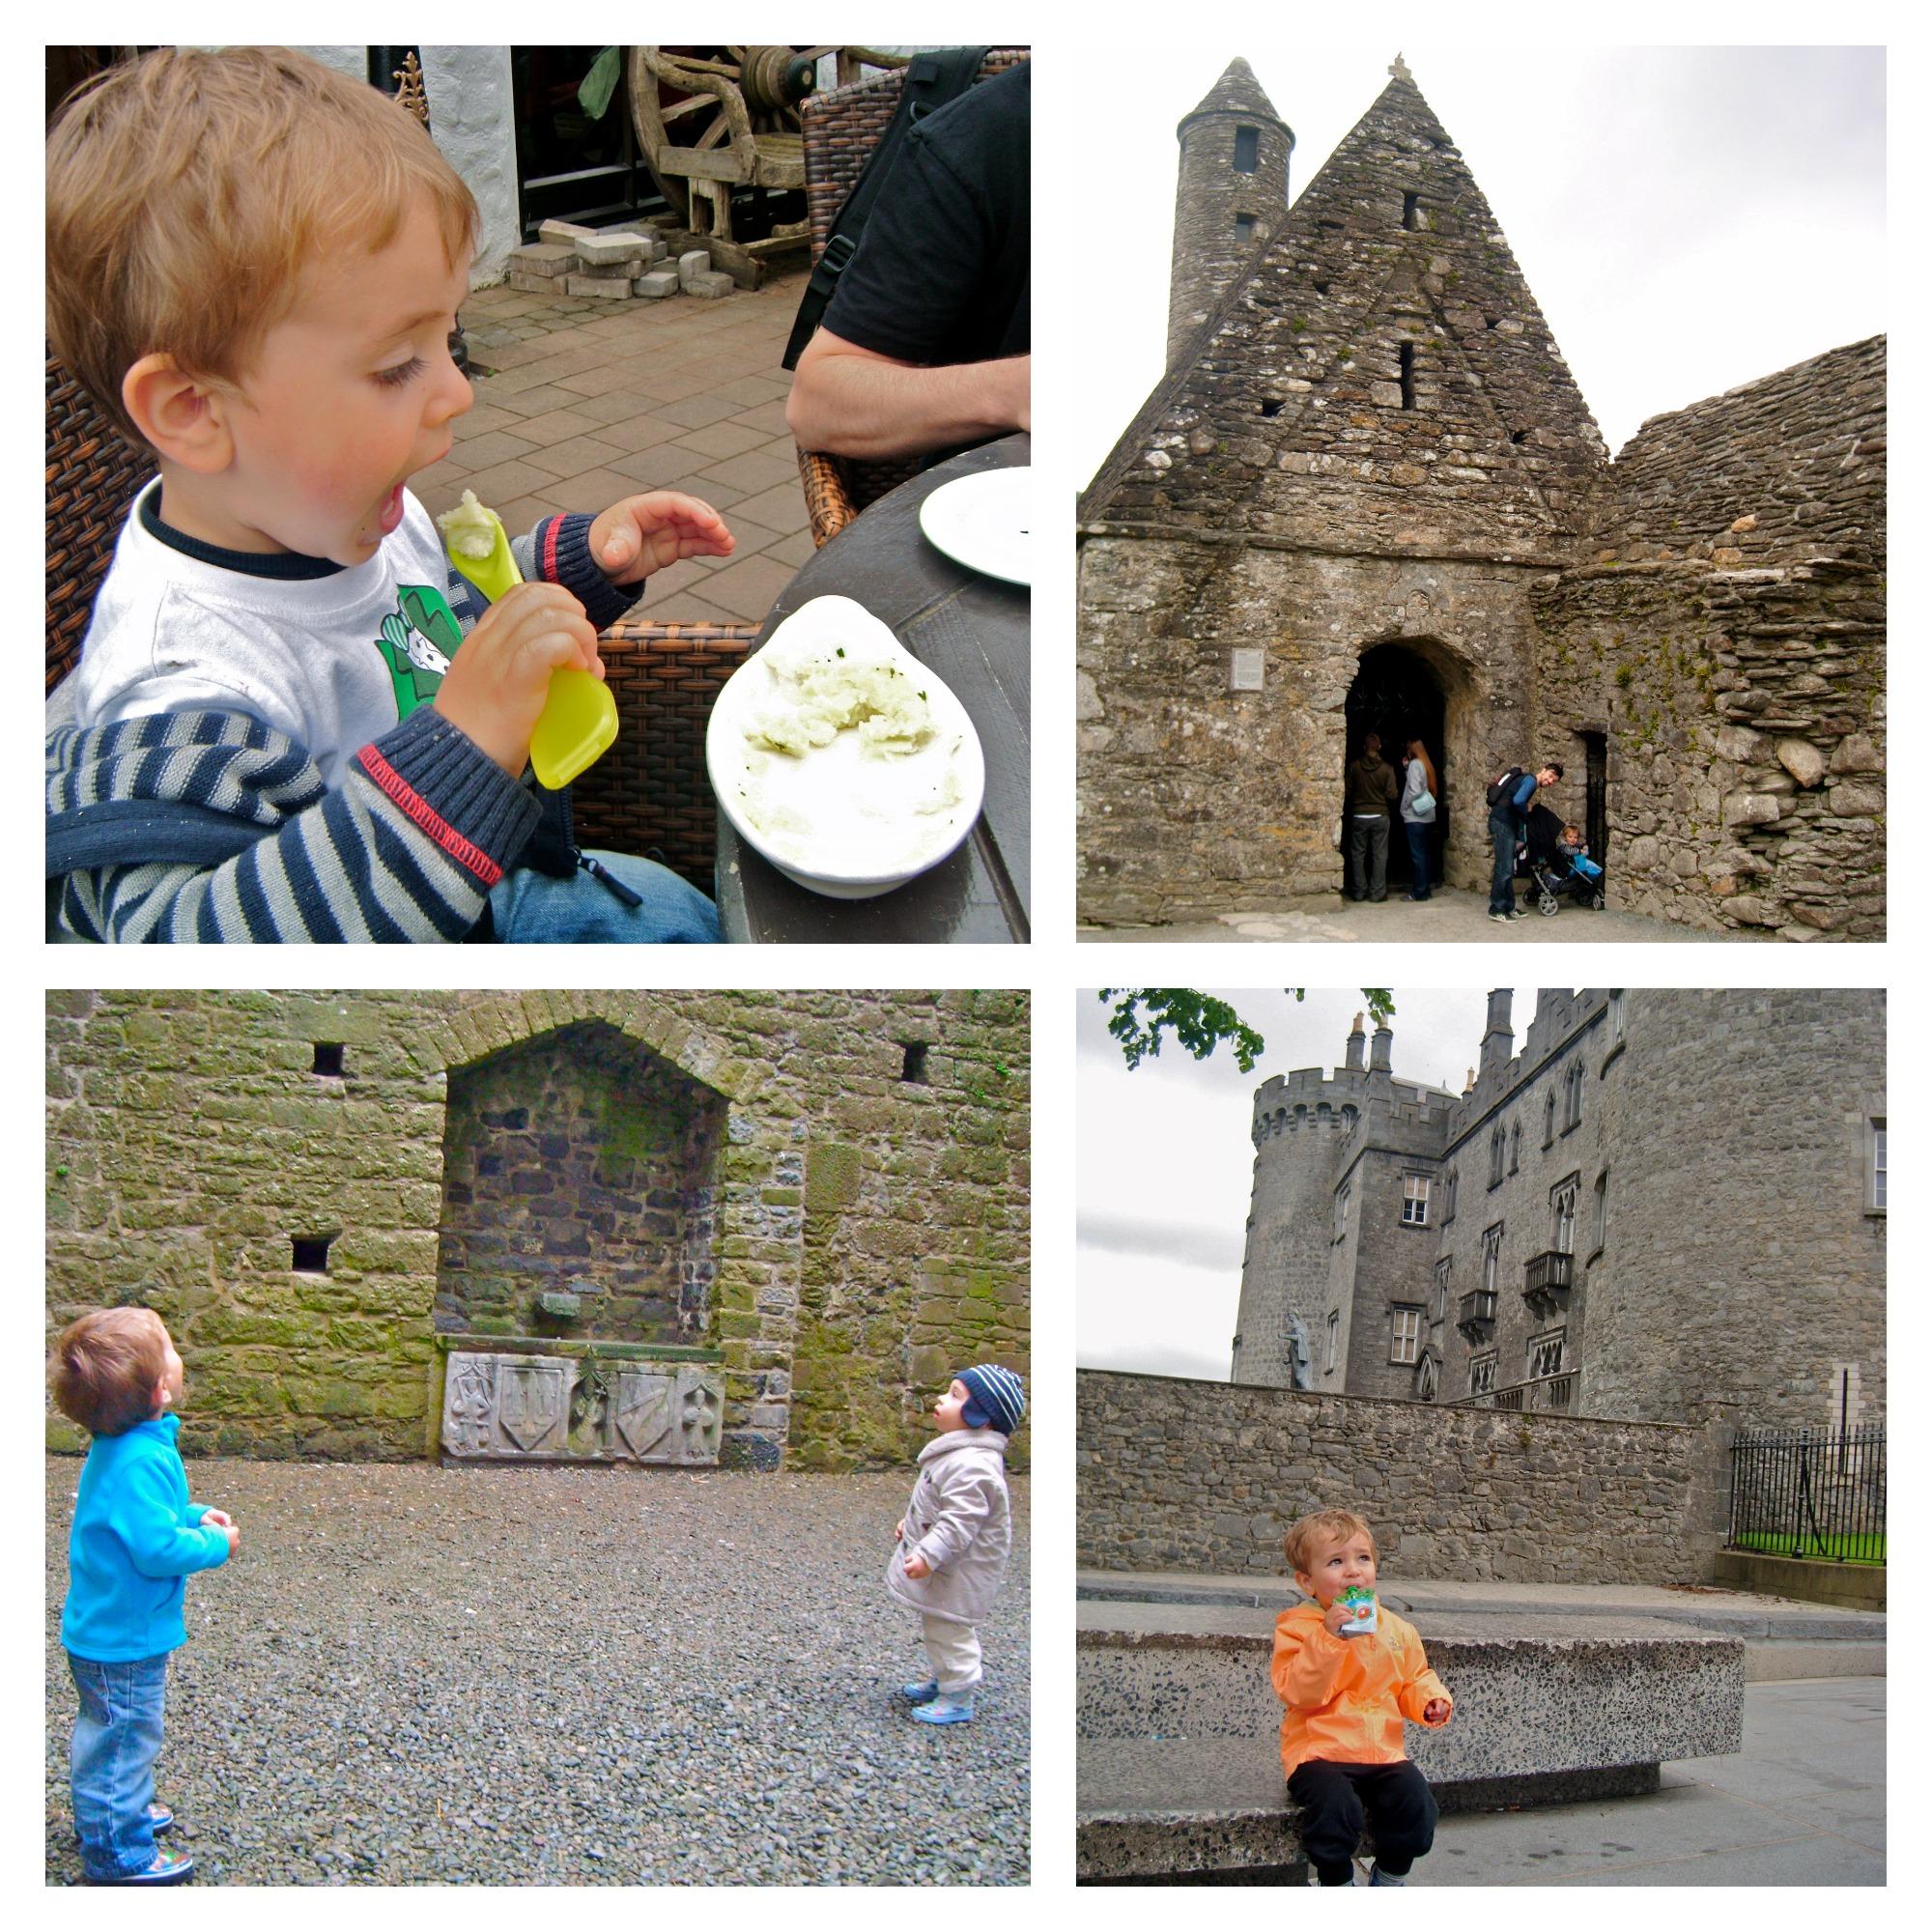 1.Comiendo Irish mashed potato, 2.Glendalough, 3.Cashel Rock, 4.Kilkeny Castle